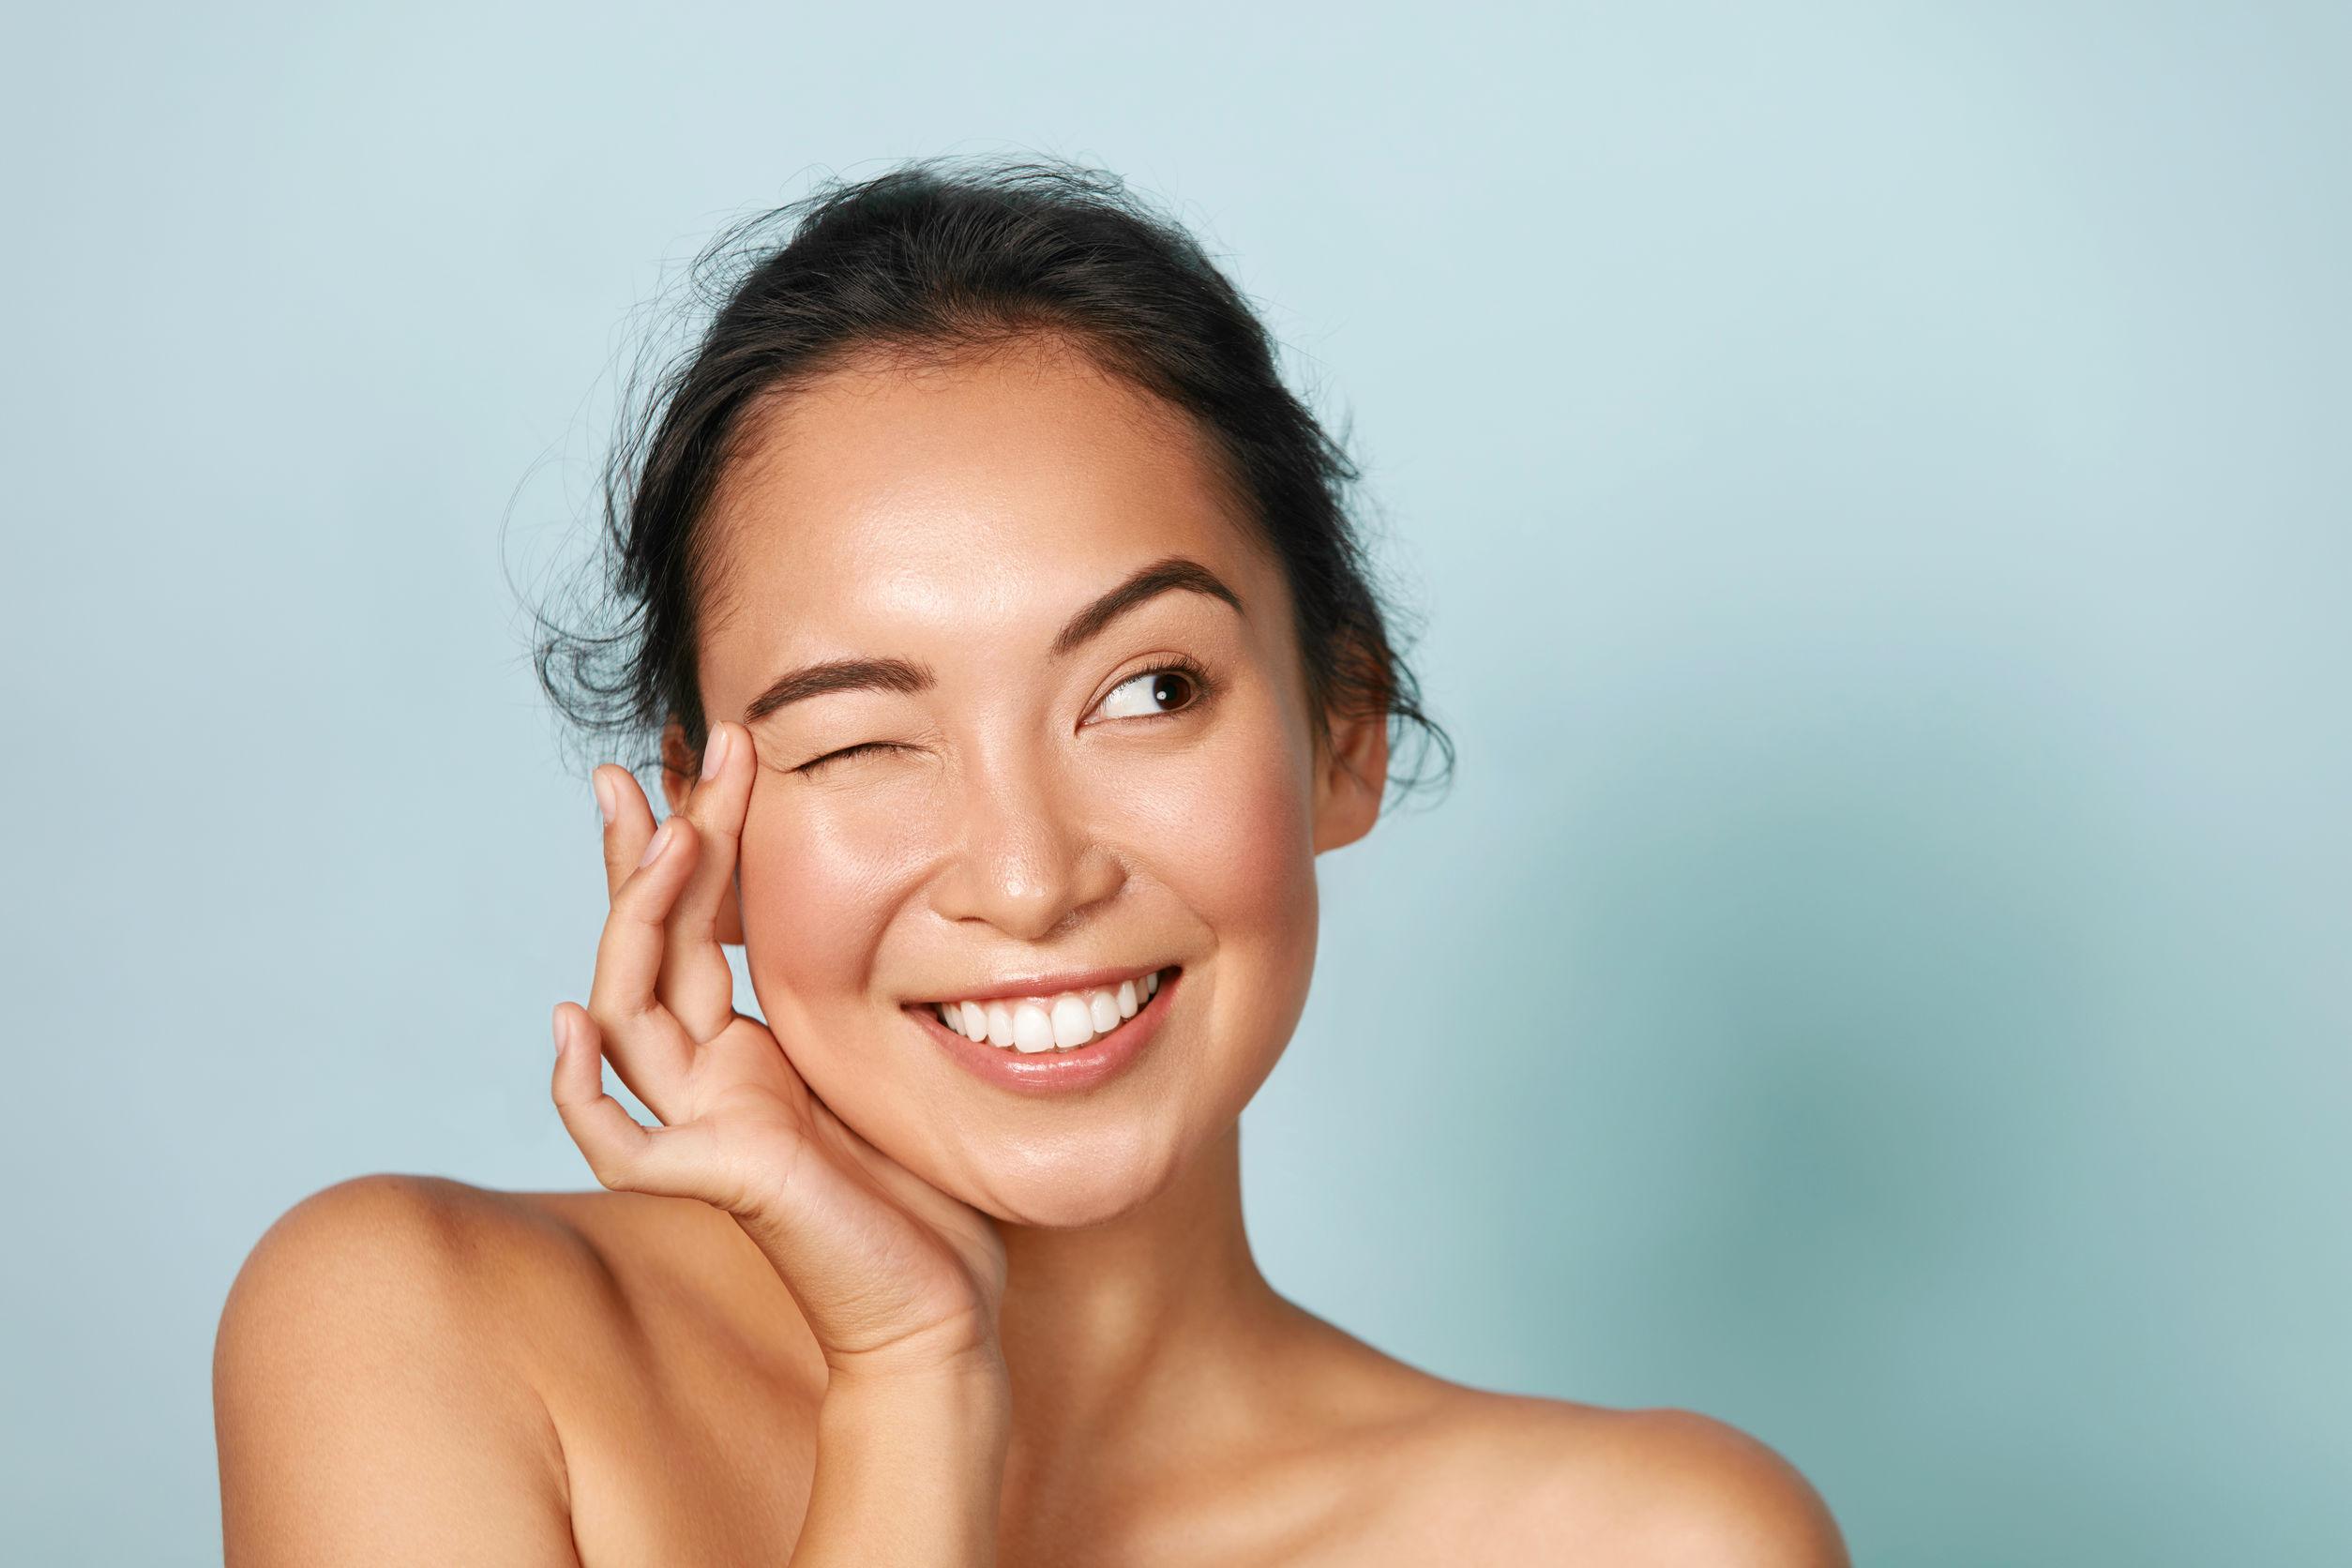 Hermosa chica asiática sonriente modelo con maquillaje natural tocando piel hidratada brillante sobre fondo azul